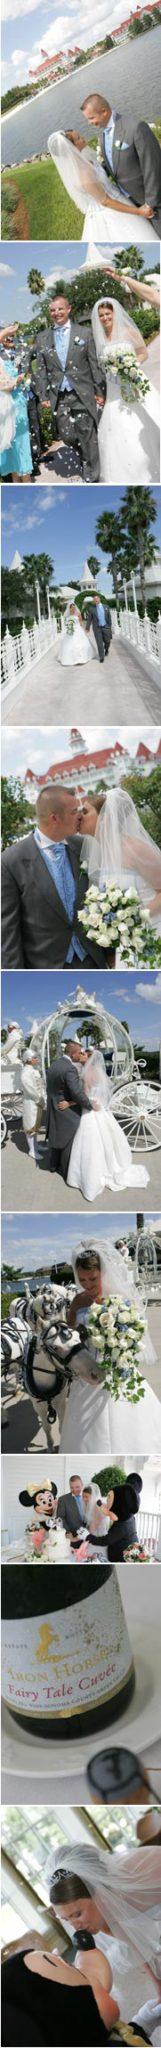 real wedding in disney world florida